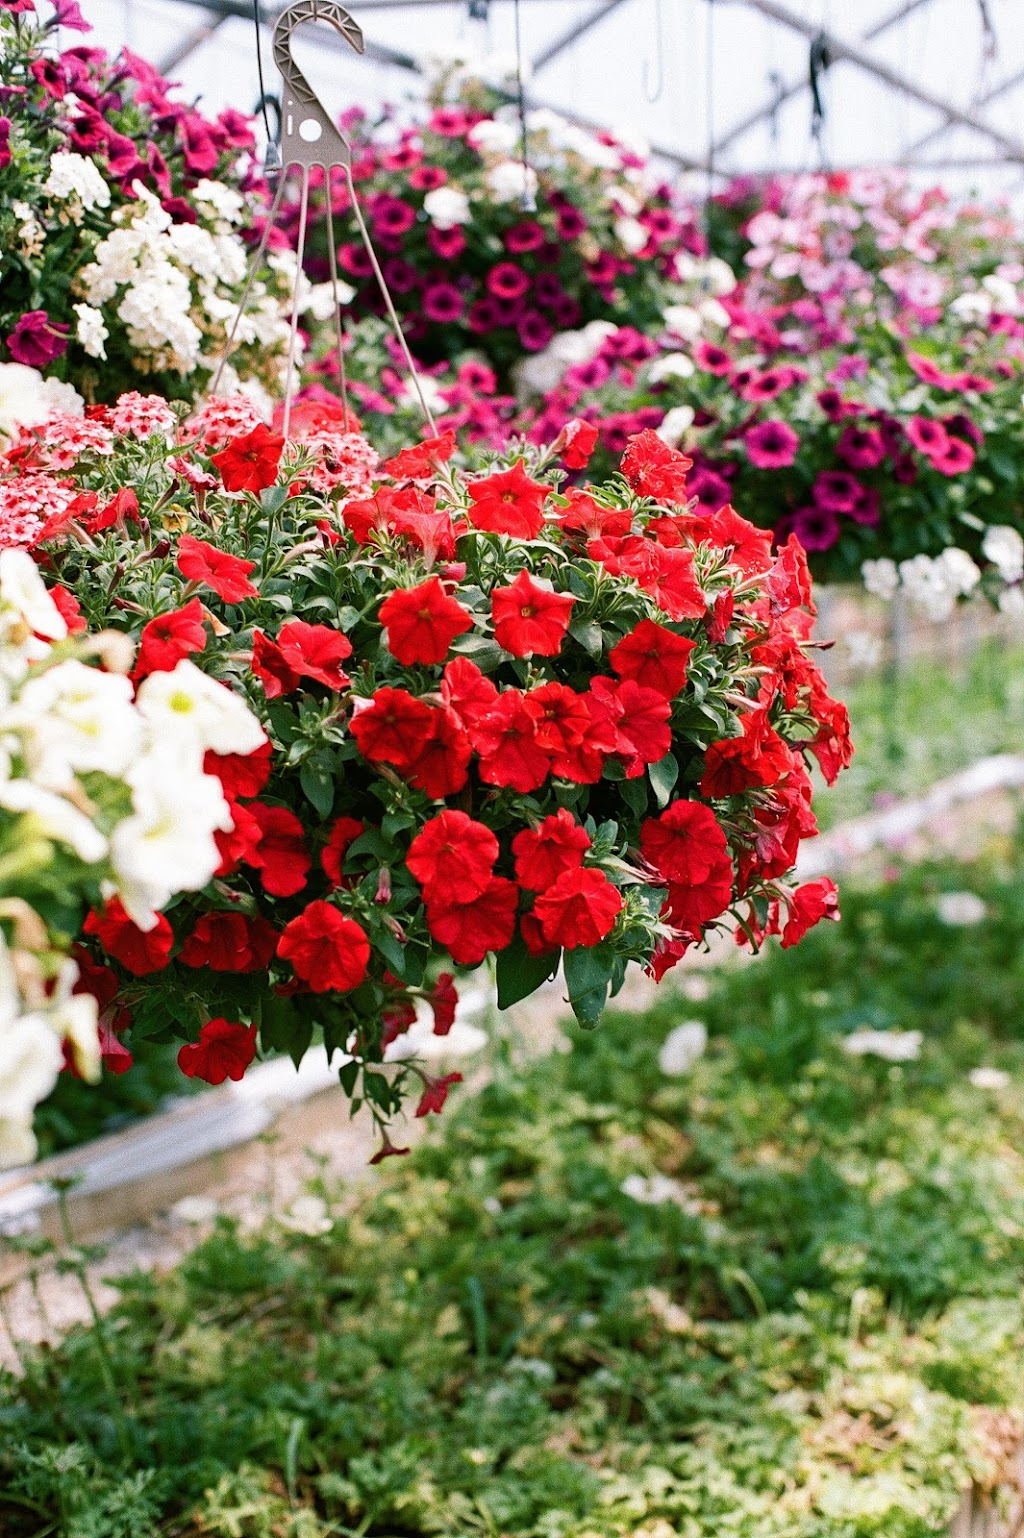 Pisarcik Flower Farm - florist    Photo 7 of 10   Address: 365 Browns Hill Rd, Valencia, PA 16059, USA   Phone: (724) 898-1434